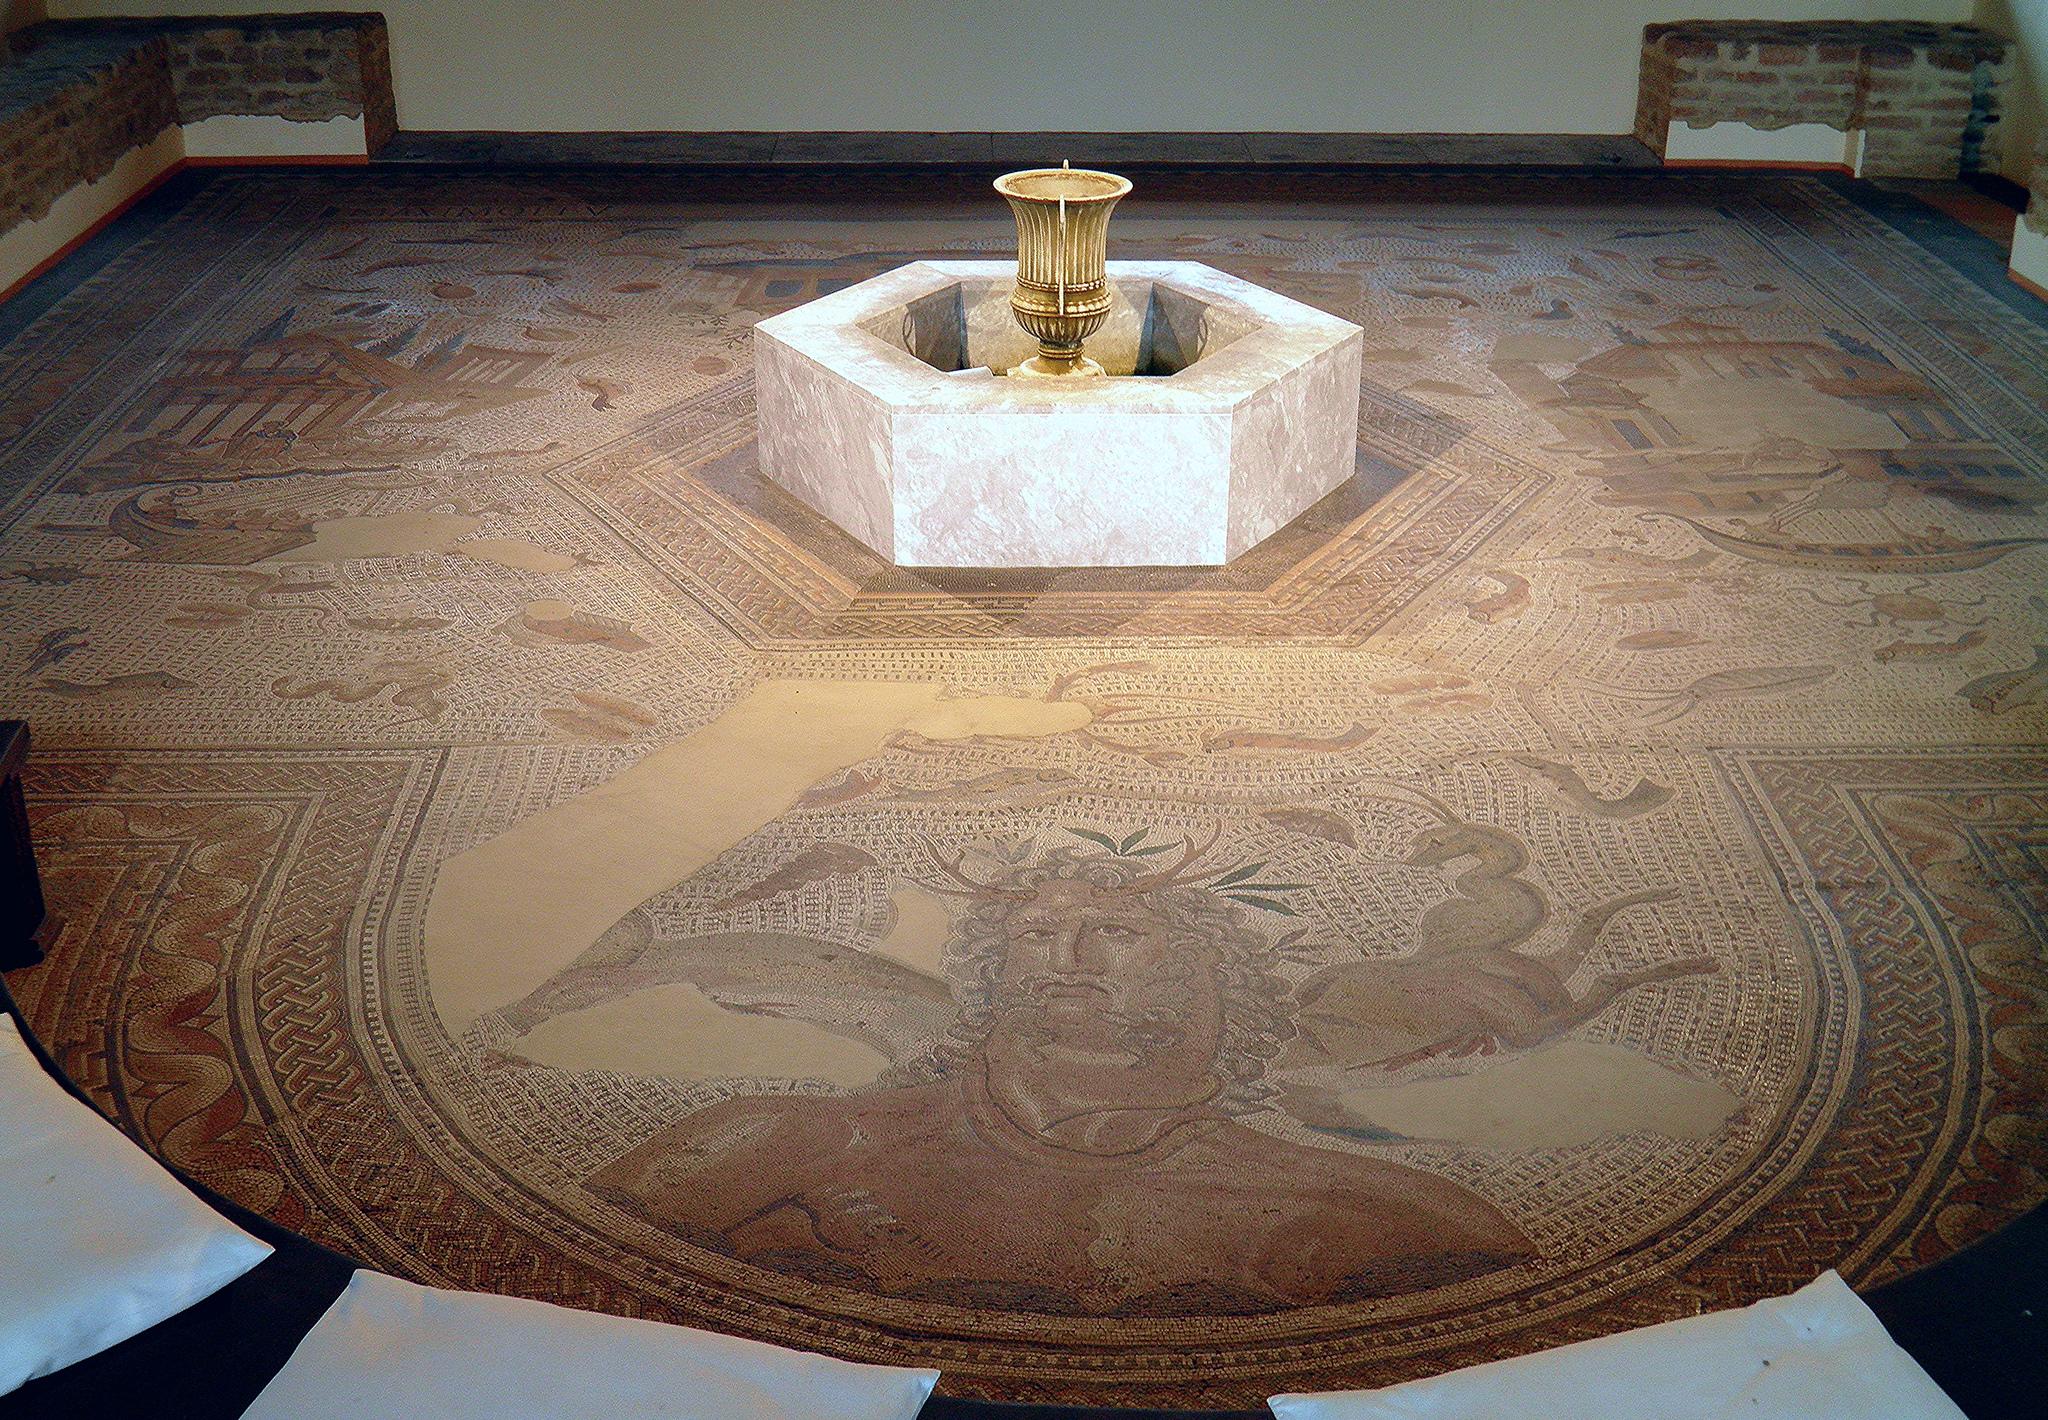 The Gladiator Mosaic at Bad Kreuznach, Germany | FOLLOWING ...